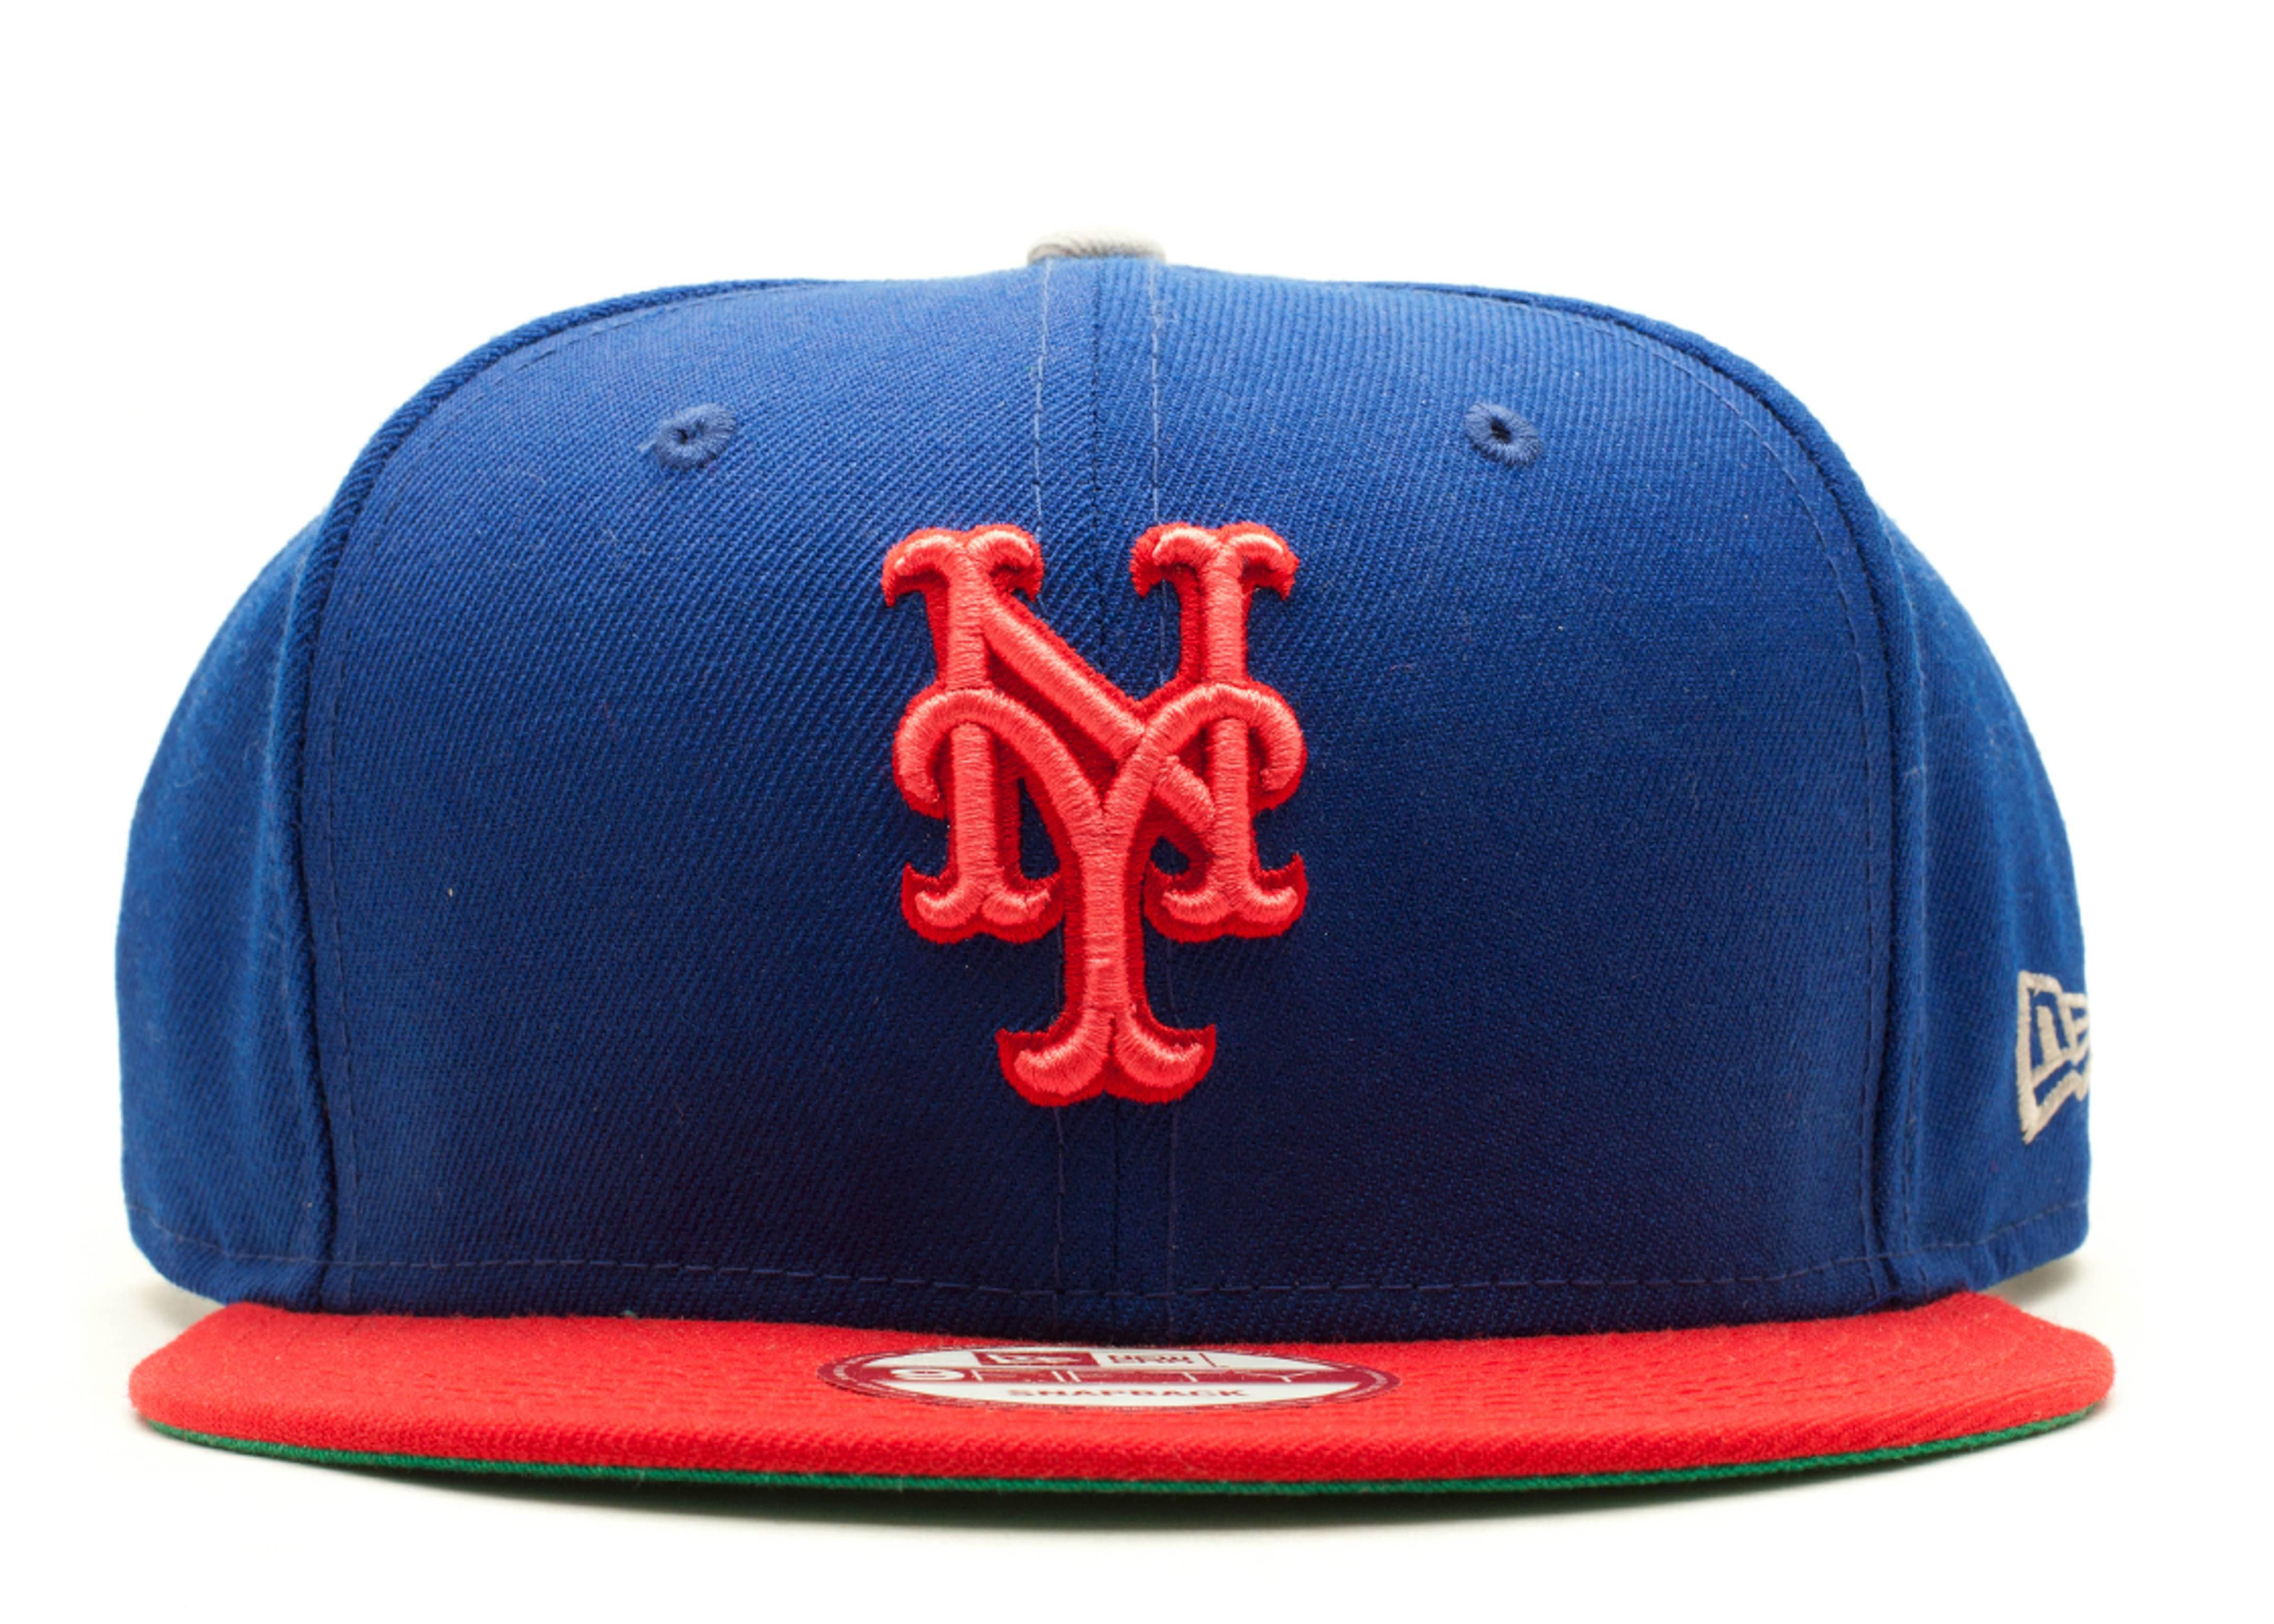 new york mets snap-backs